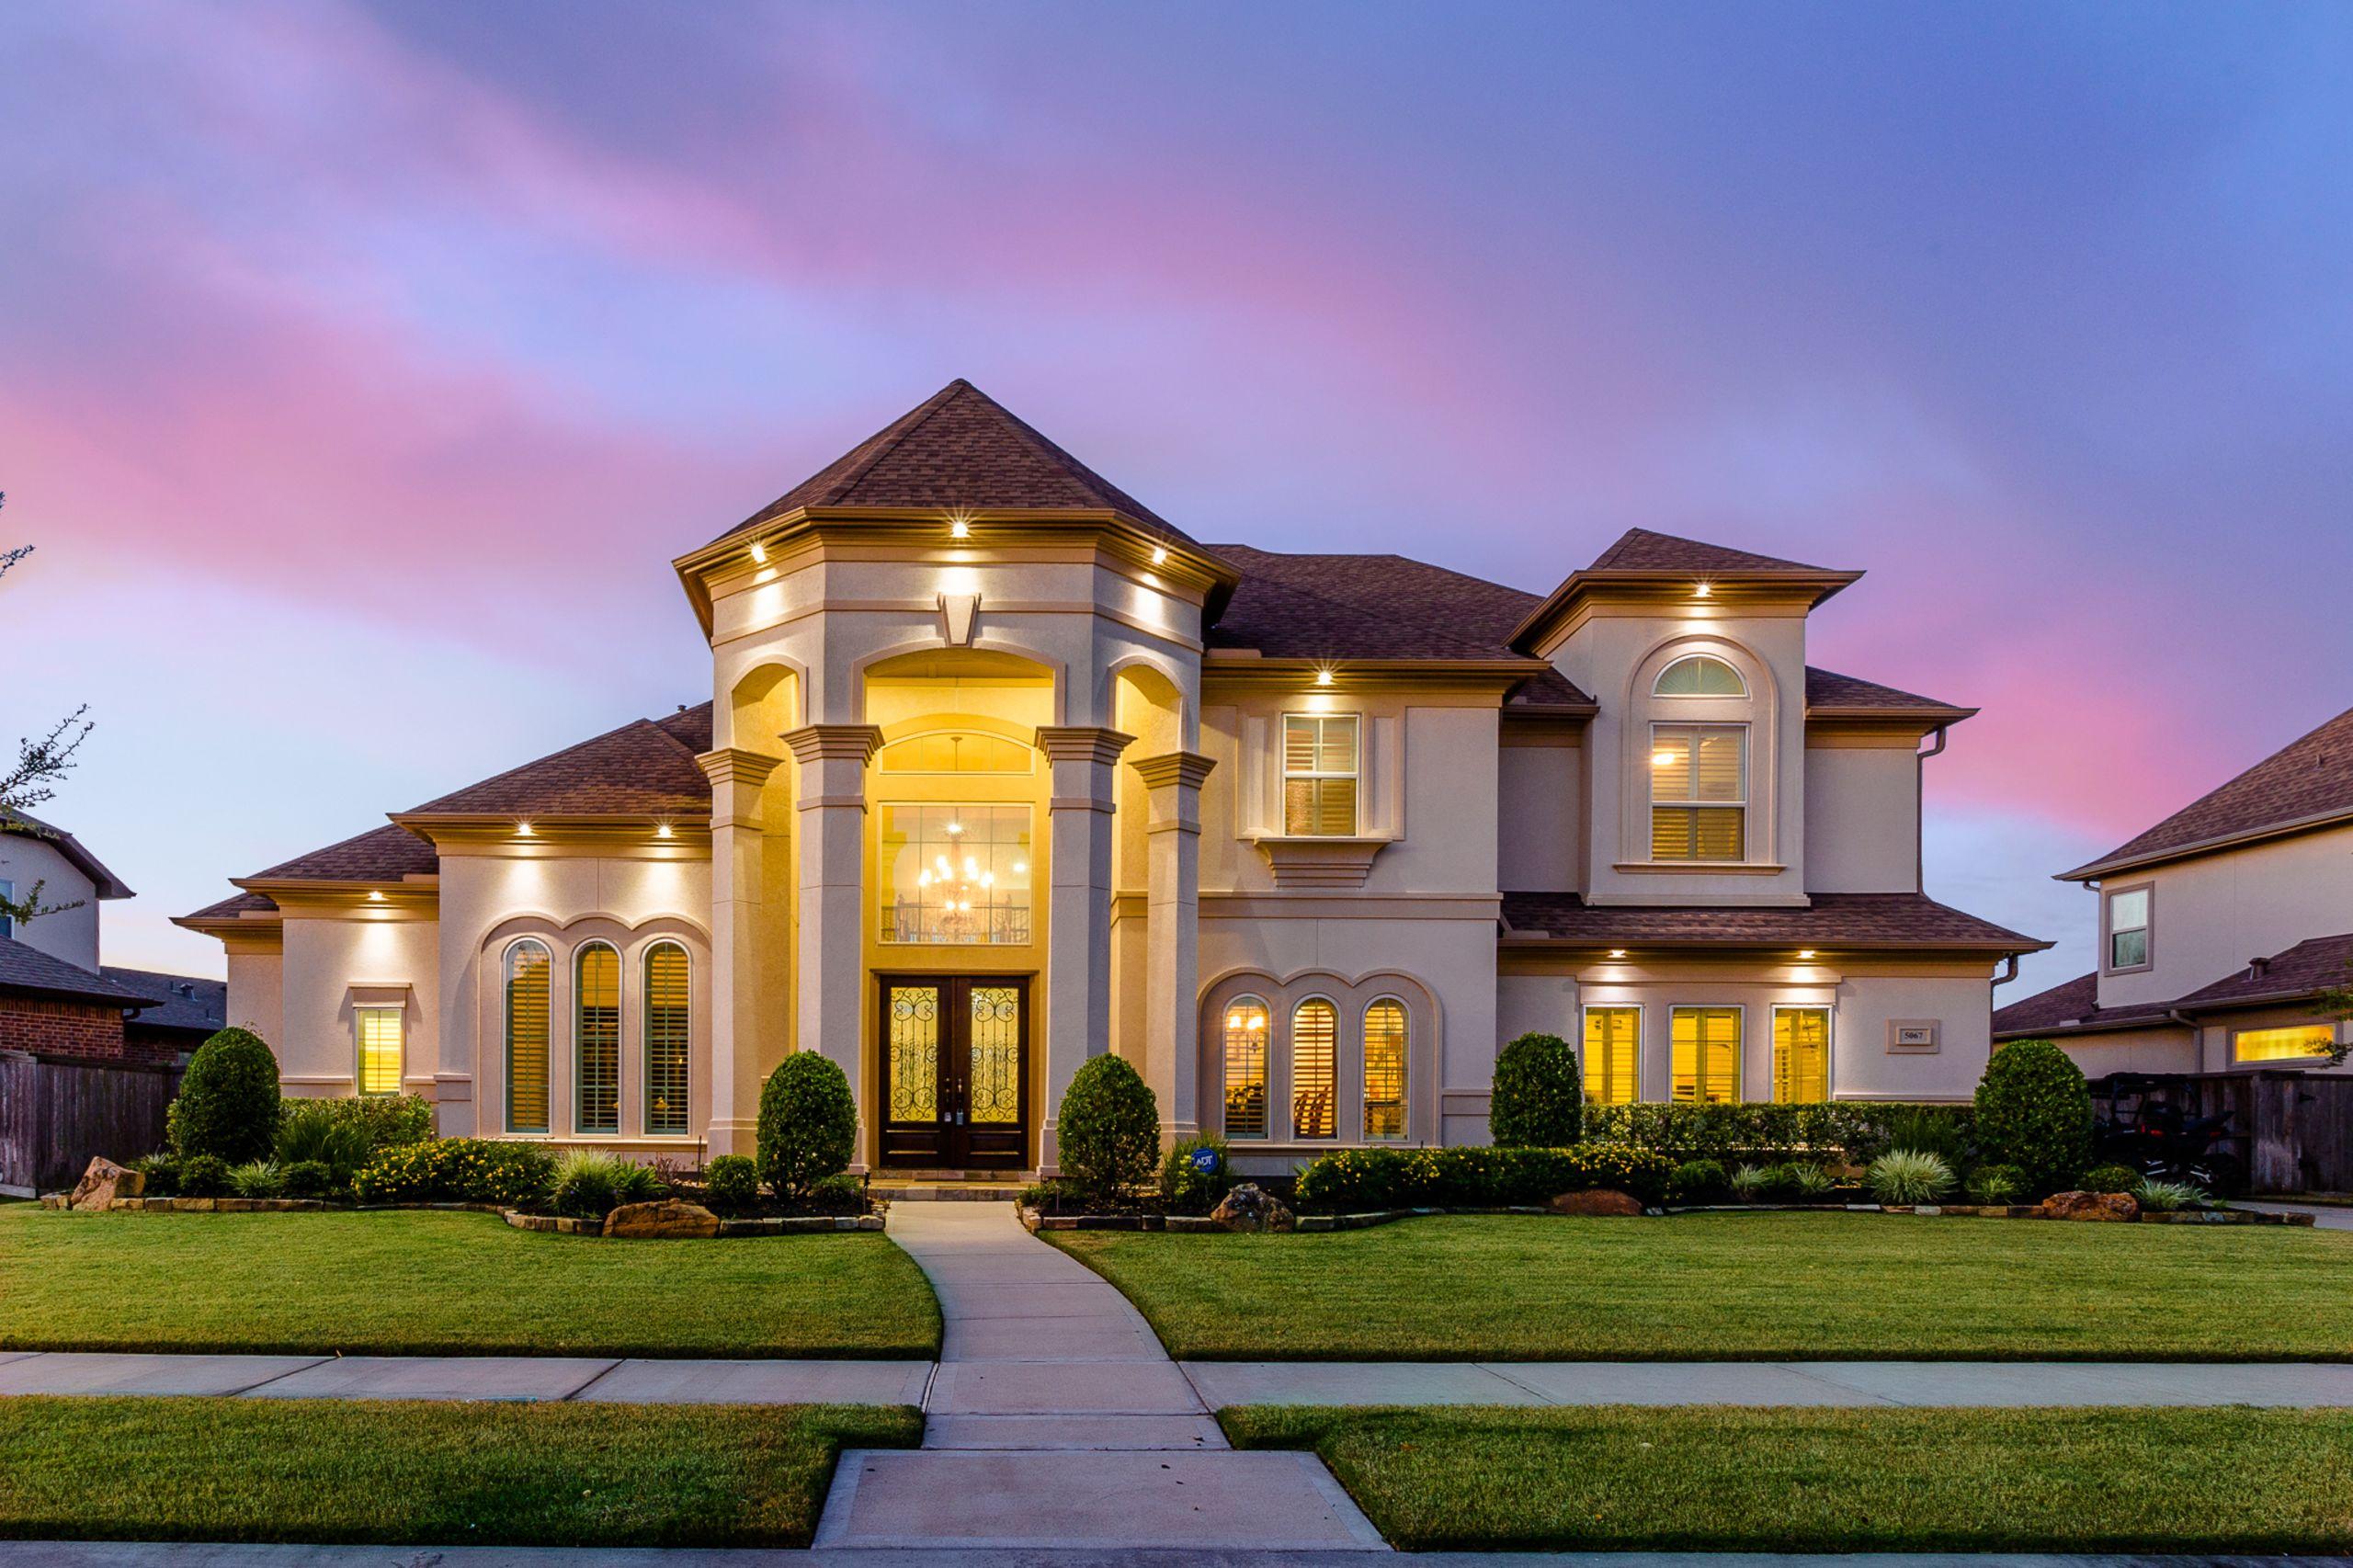 Luxury Million Dollar Pool House!